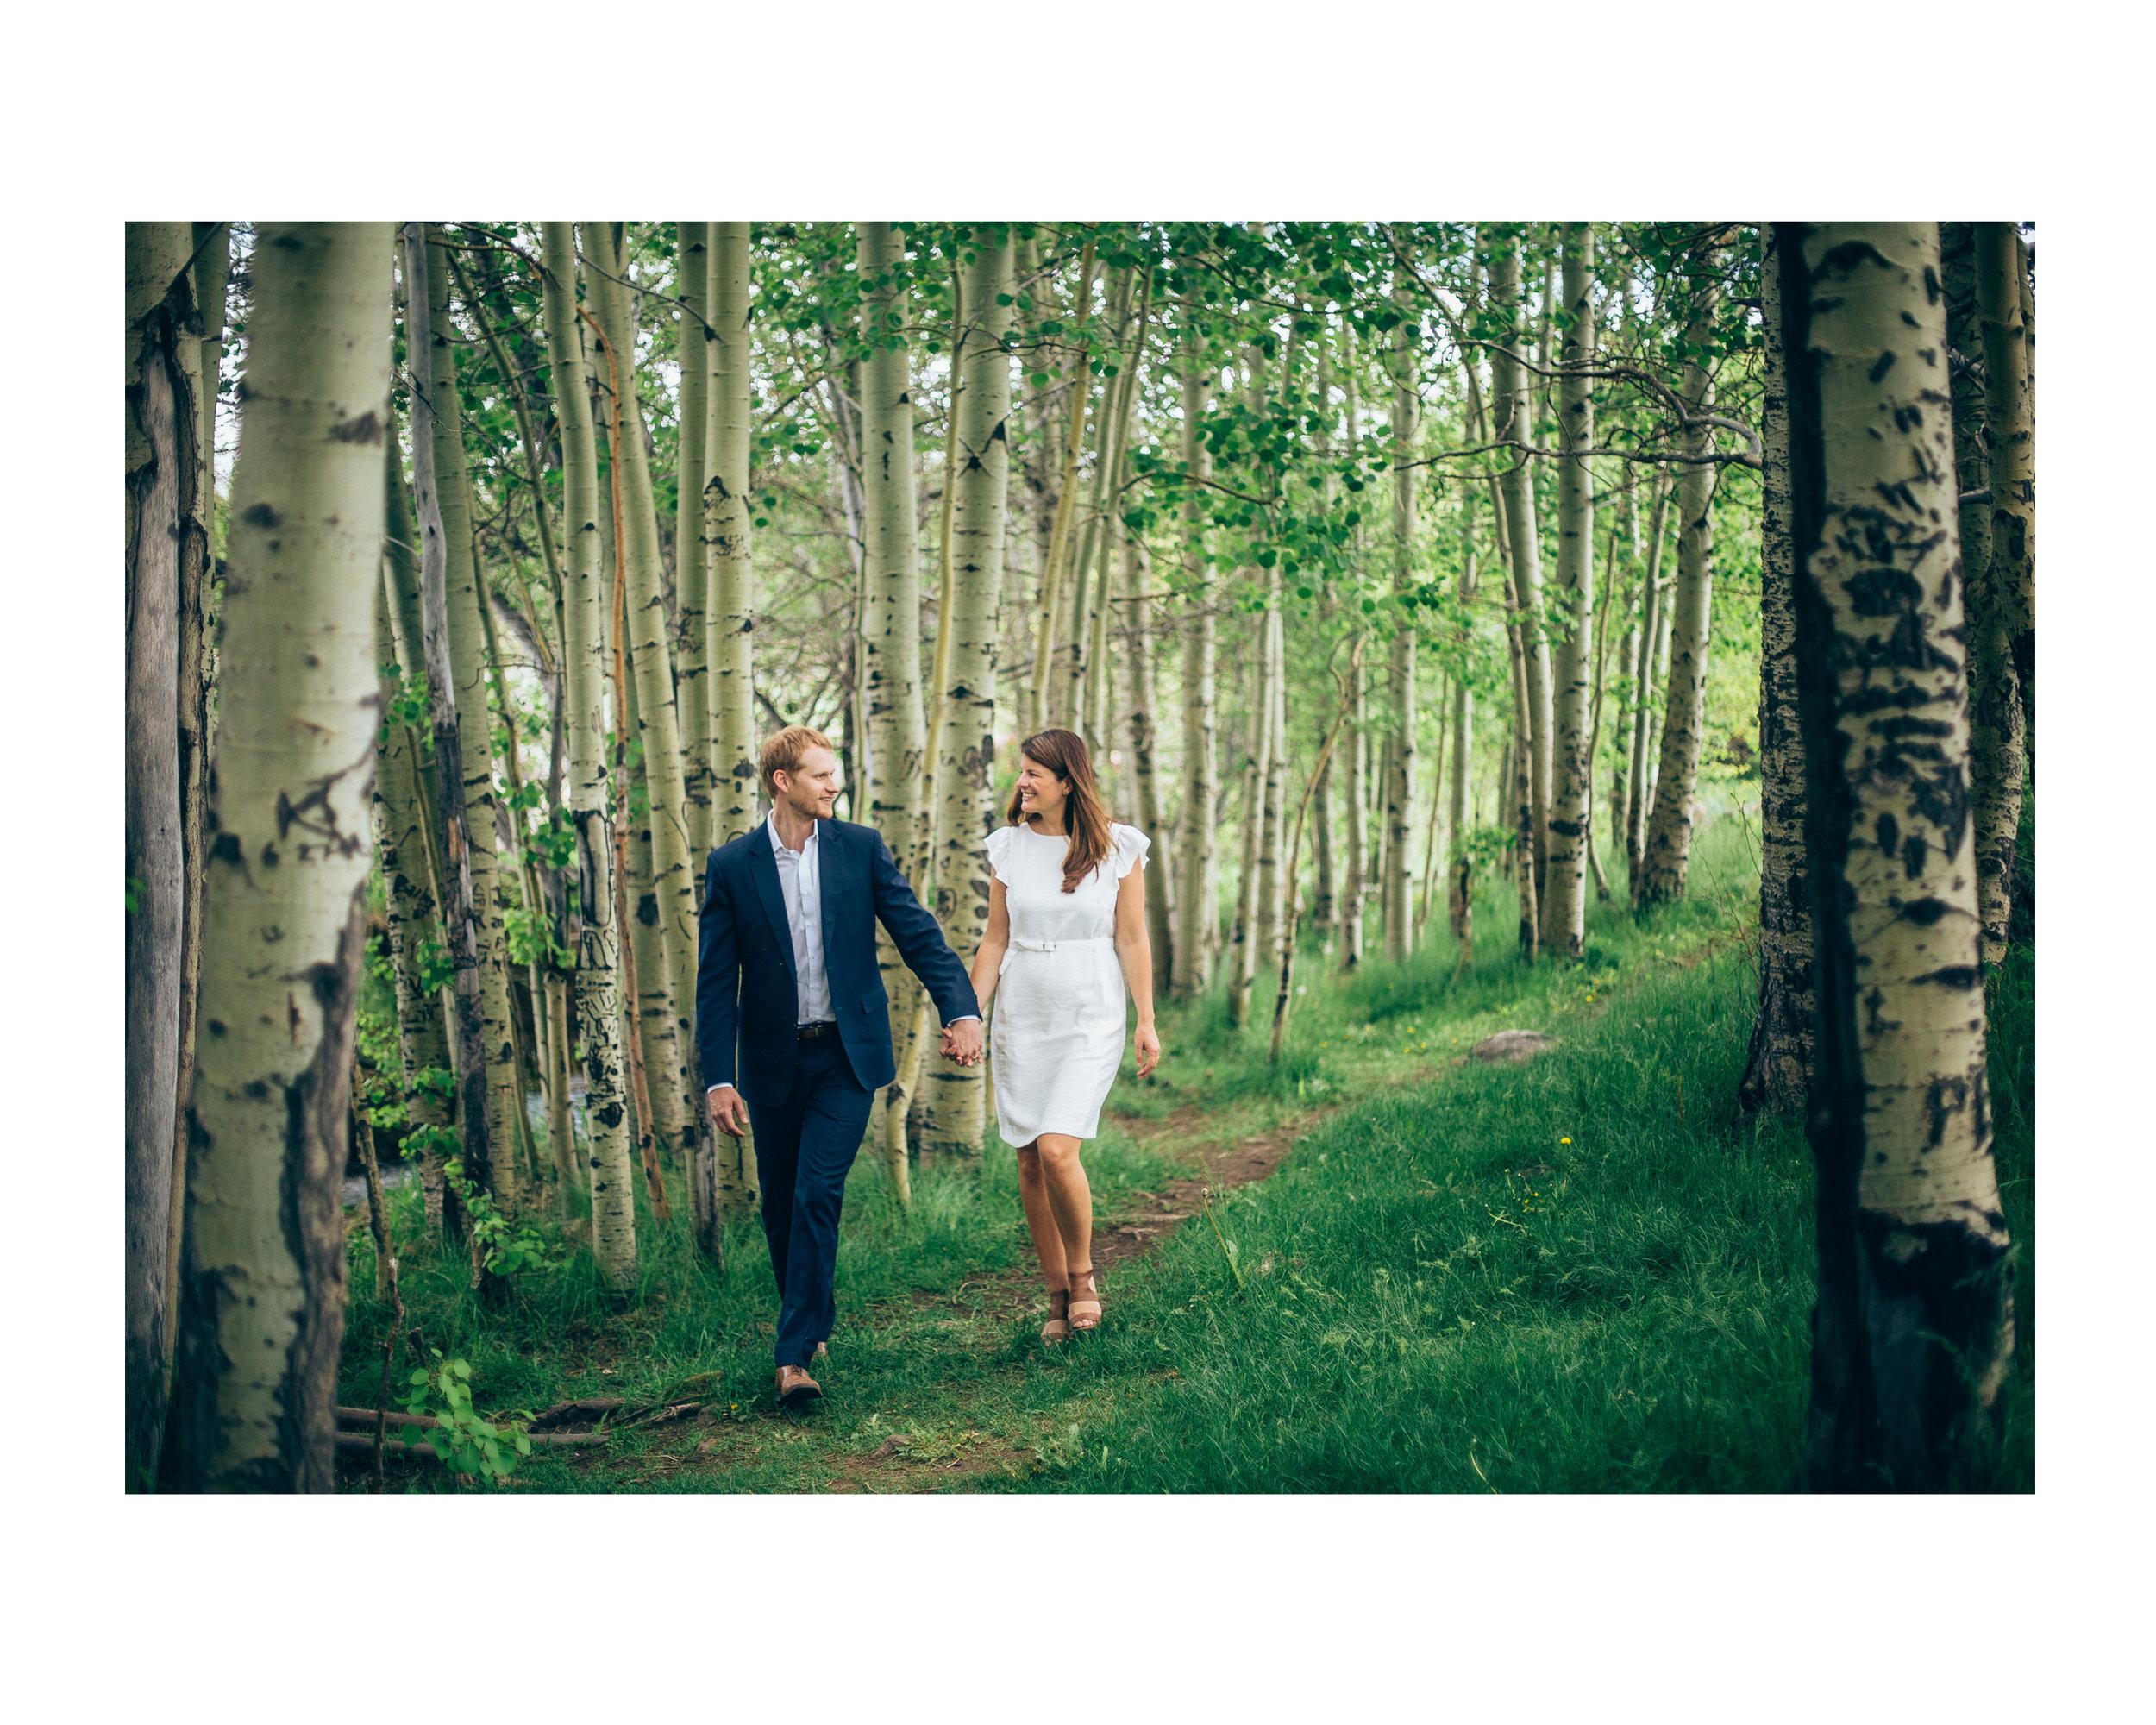 Melisa&David_Wedding_Day_009.jpg